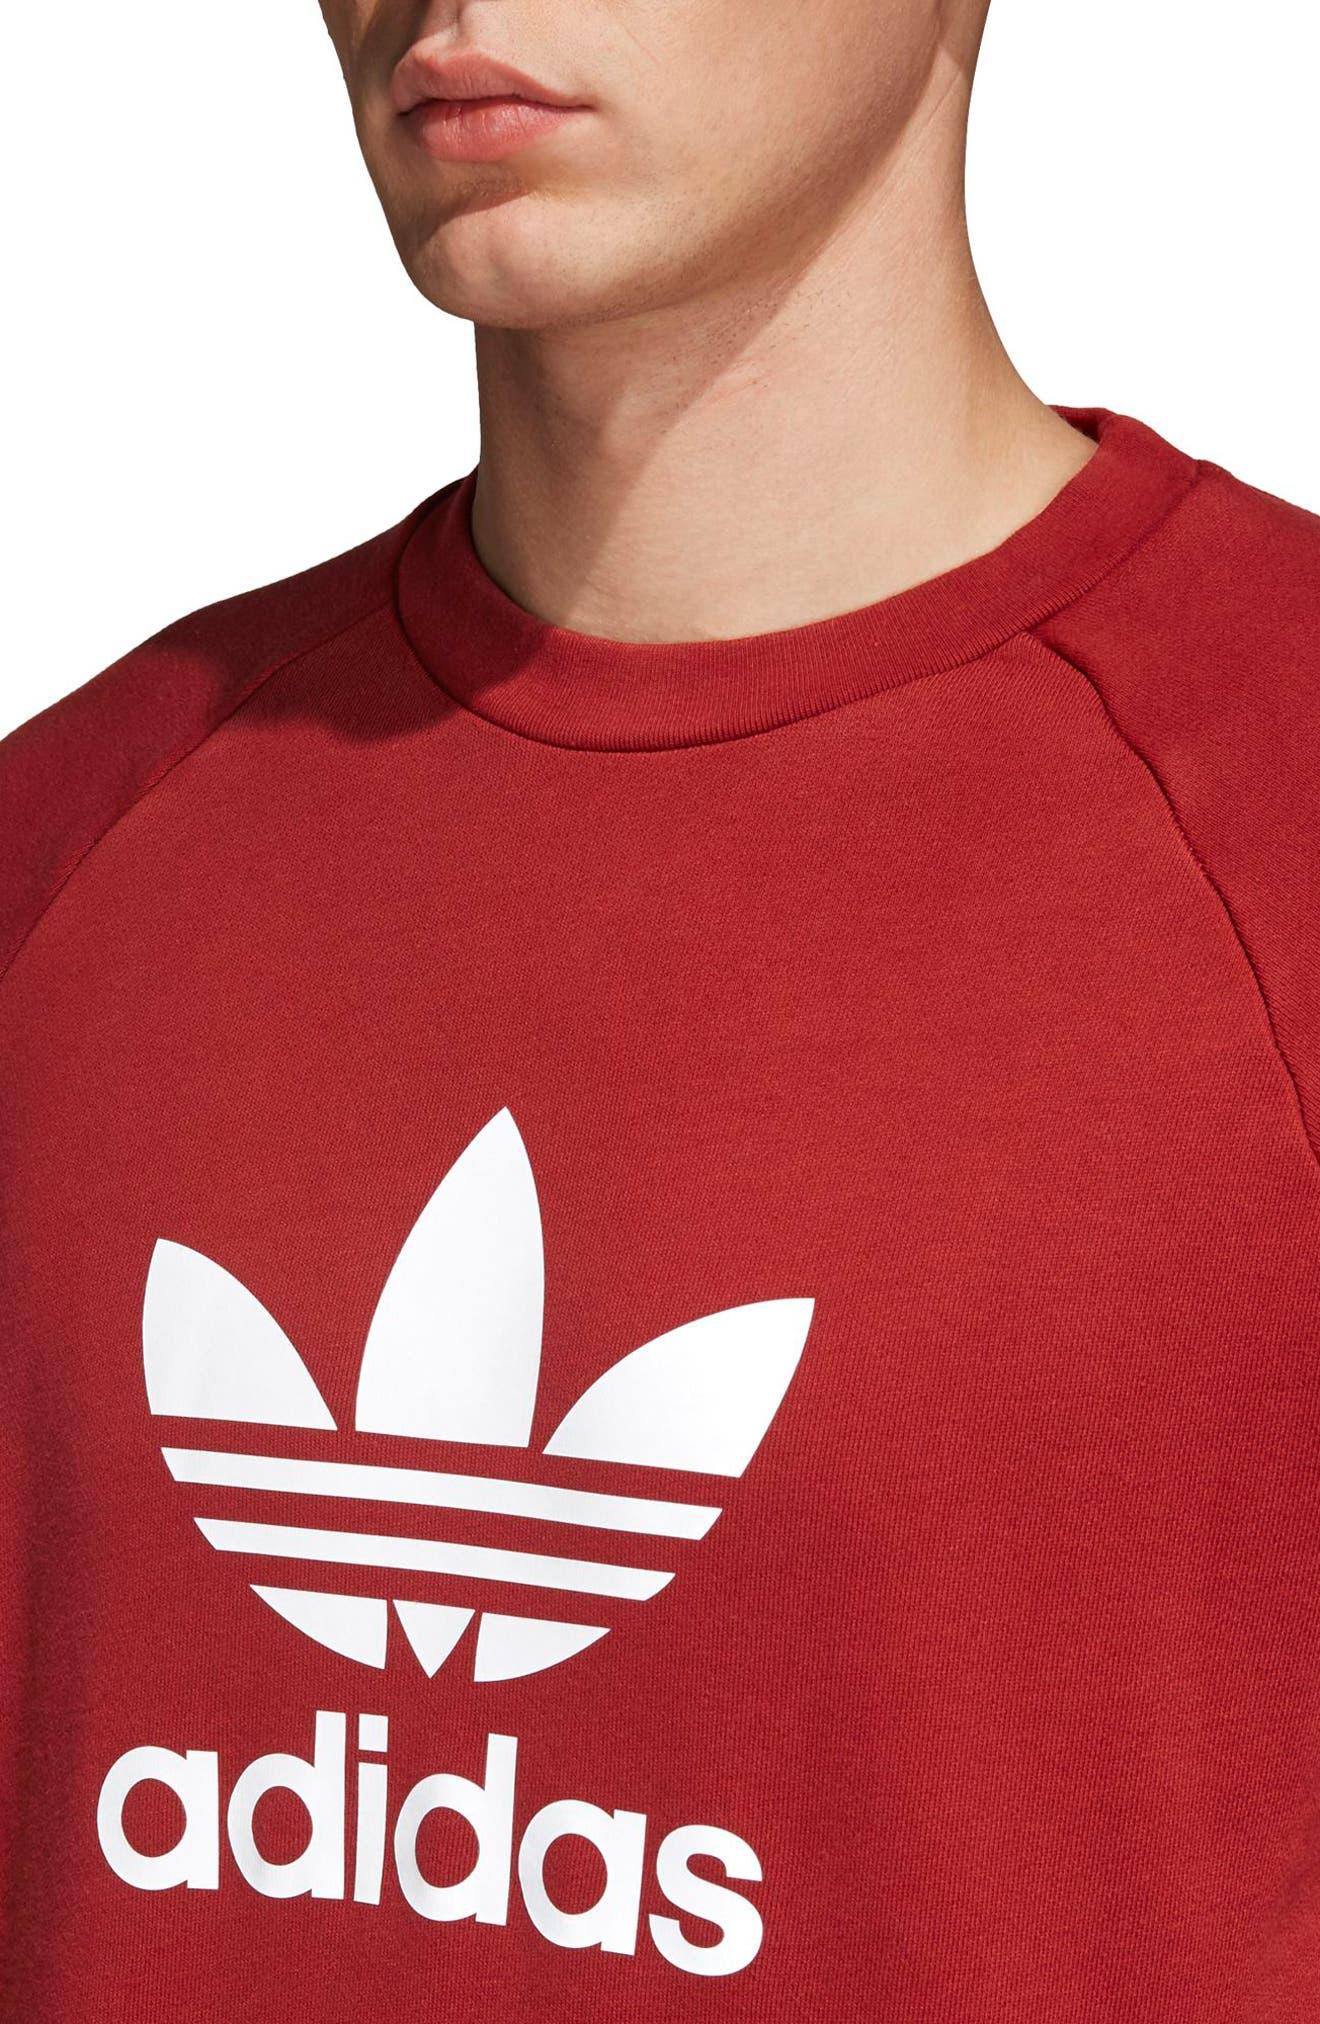 adidas Trefoil Crewneck Sweatshirt,                             Alternate thumbnail 8, color,